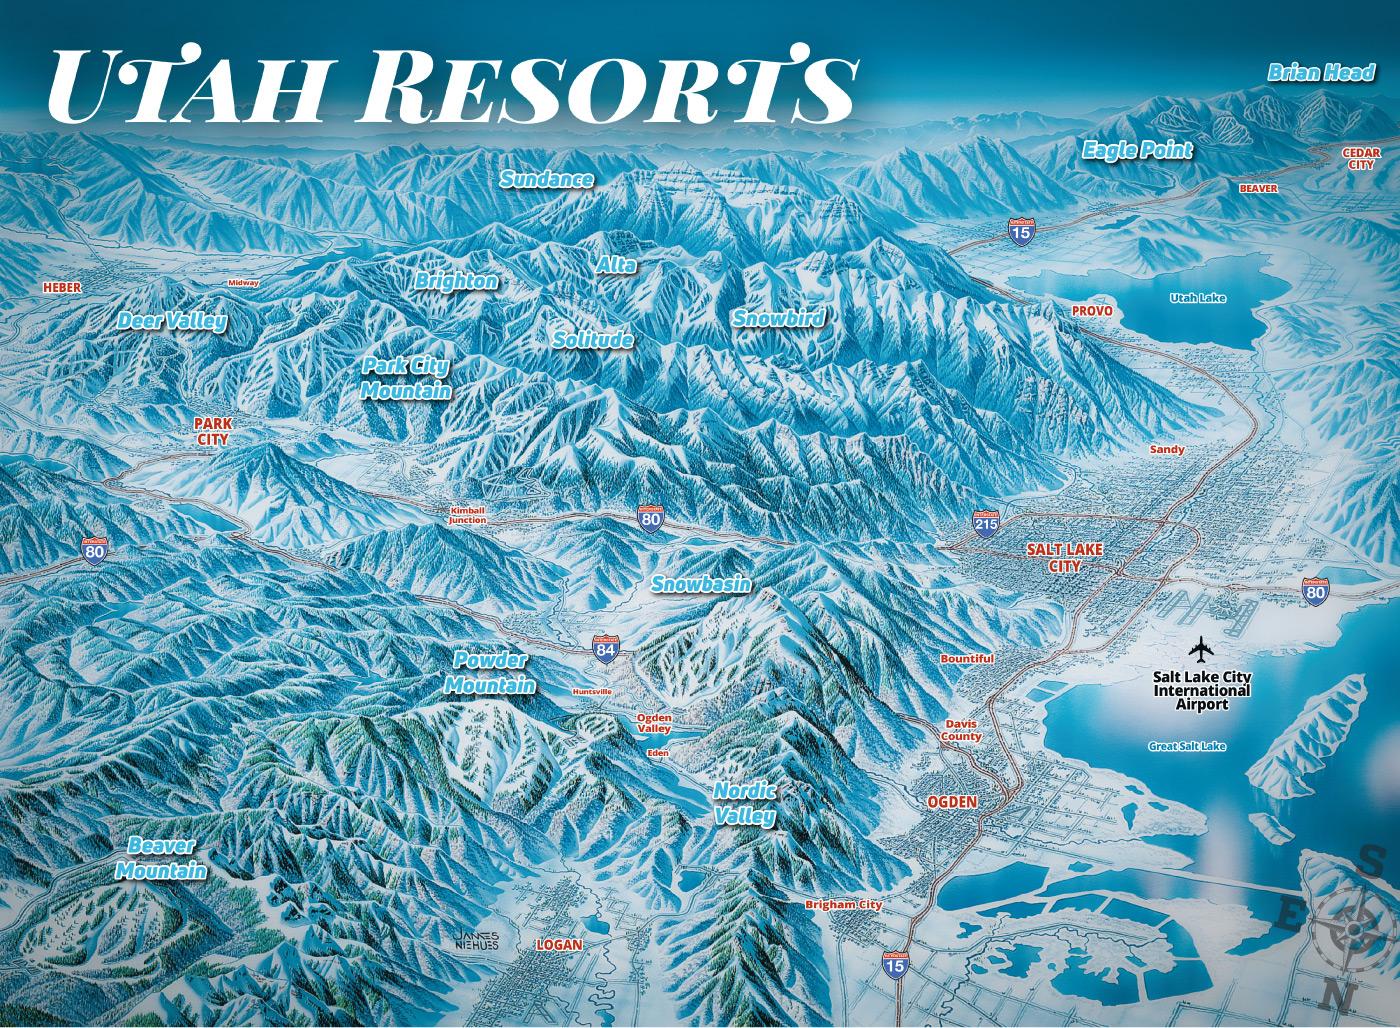 Friends-ResortMap-Big-1400w Salt Lake City Ski Areas Map on summit county ski areas map, north carolina ski areas map, idaho ski areas map, new england ski areas map, colorado ski areas map, washington ski areas map, michigan ski areas map, wyoming ski areas map, vermont ski areas map, alaska ski areas map, california ski areas map, new hampshire ski areas map, new mexico ski areas map, utah ski areas map, maine ski areas map, aspen ski areas map, west virginia ski areas map, denver ski areas map, montana ski areas map, massachusetts ski areas map,